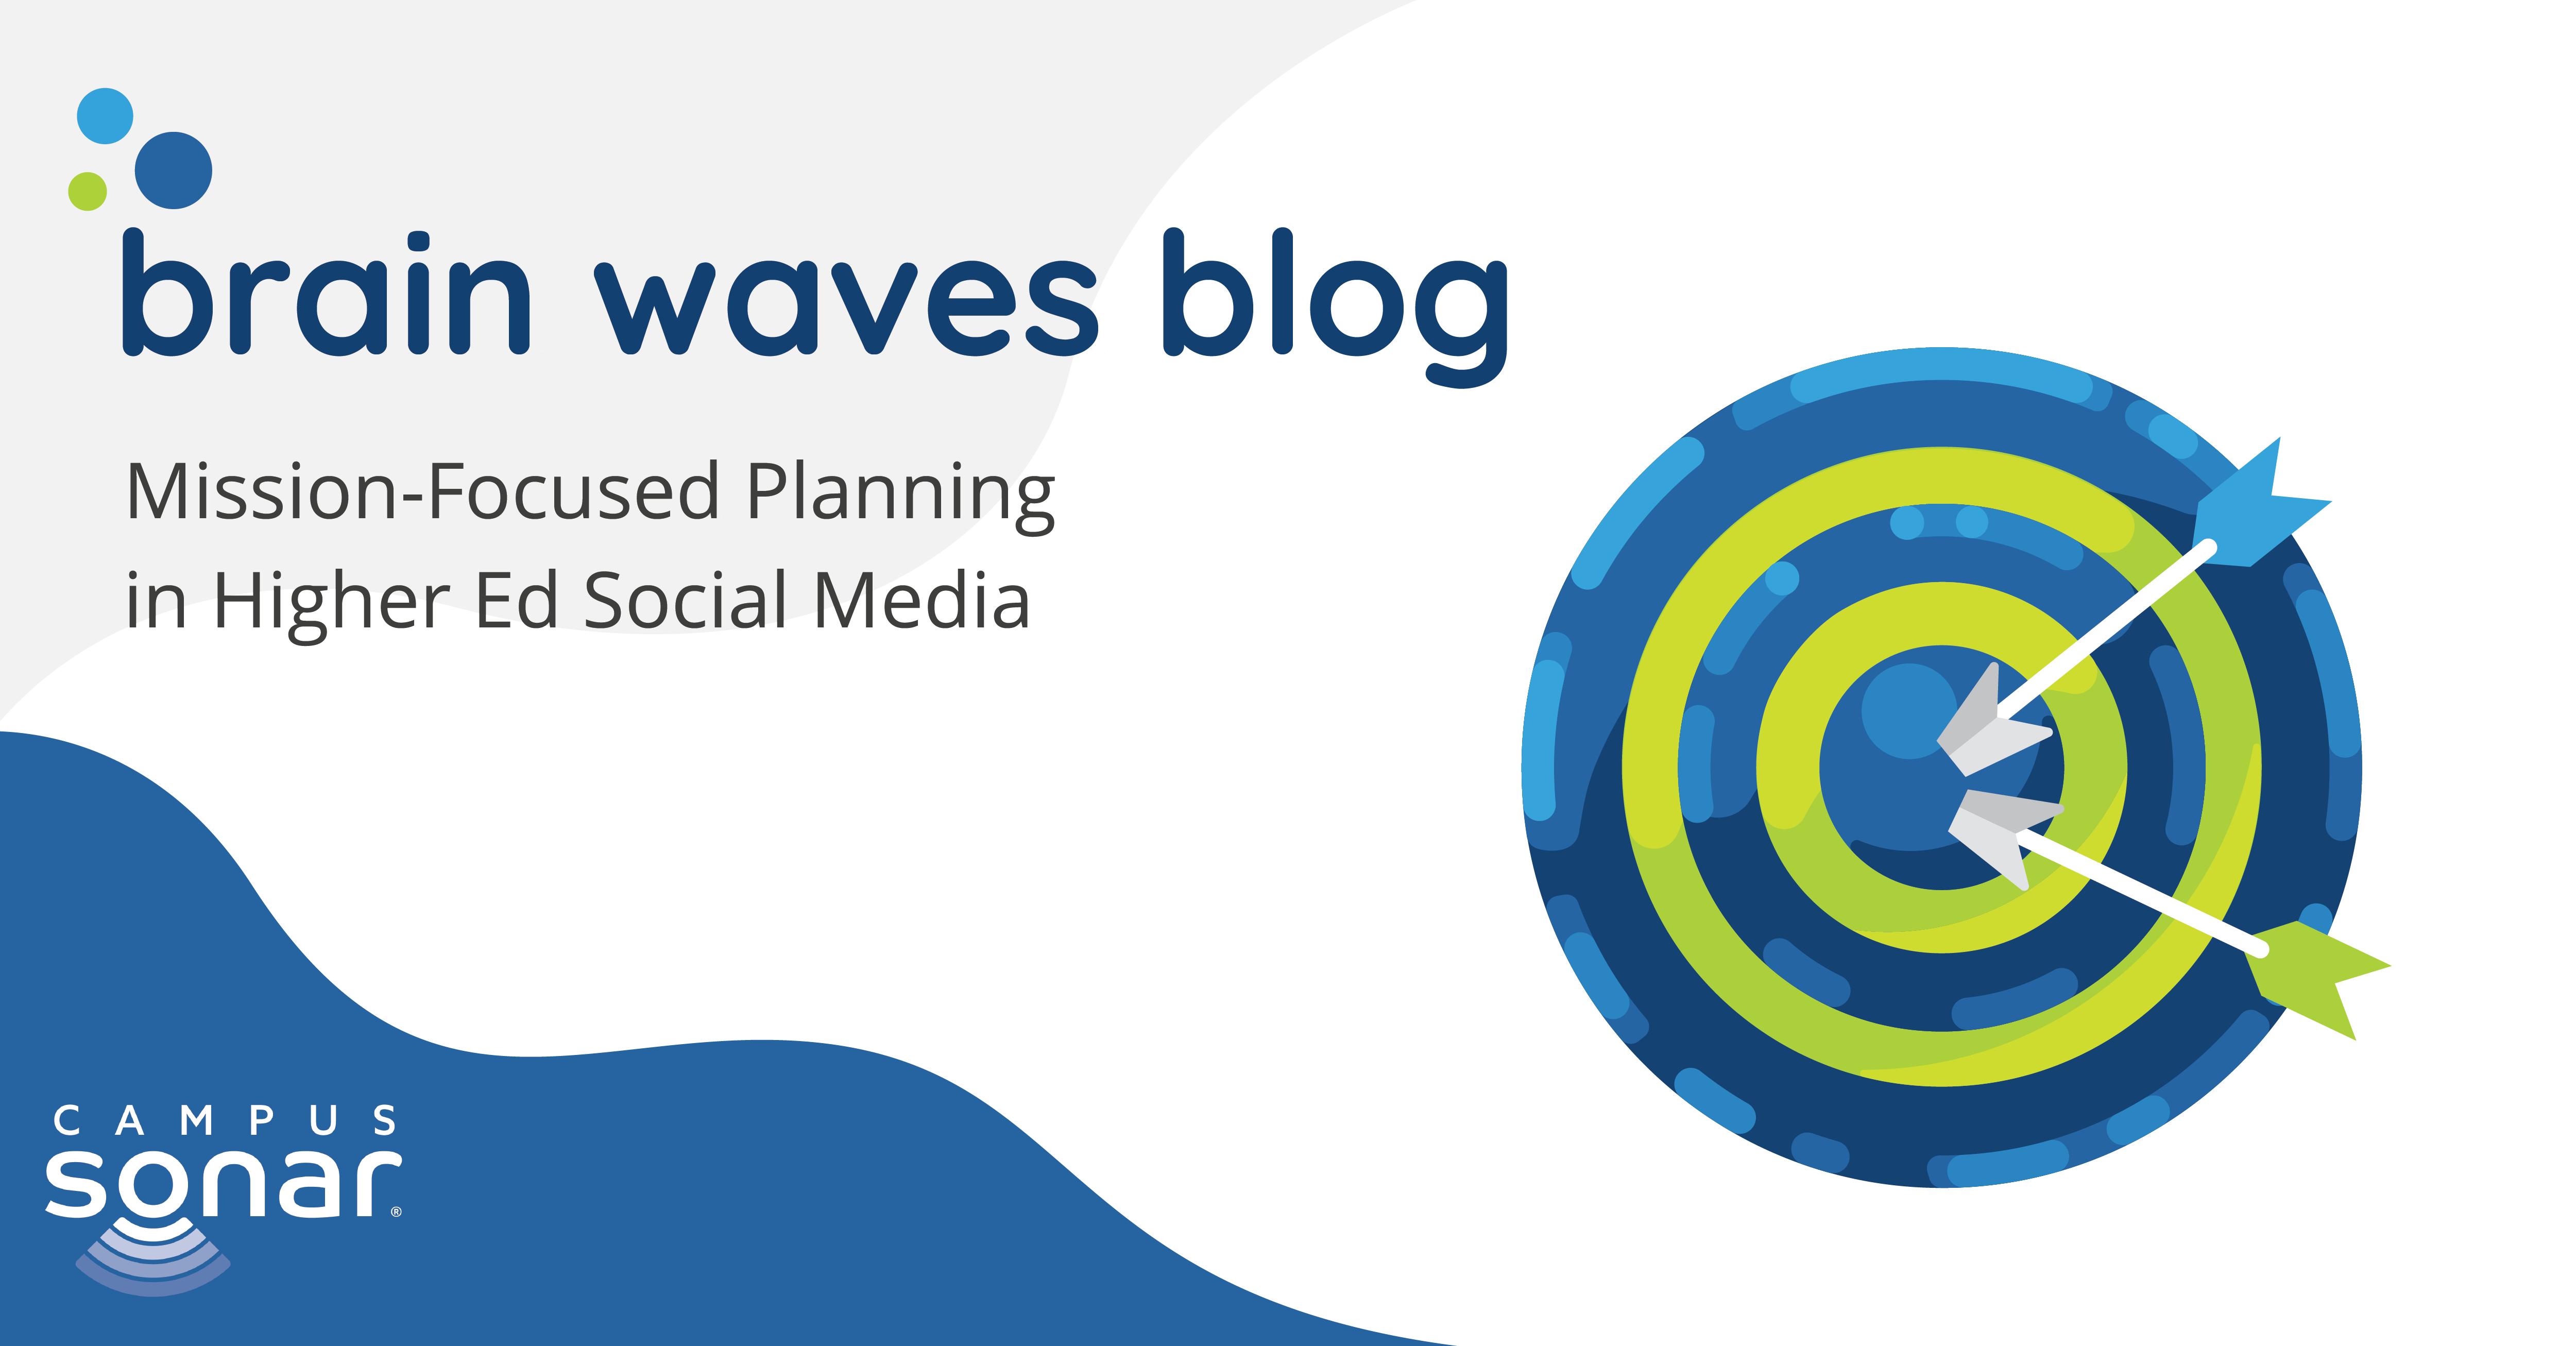 Brain Waves Blog: Mission-Focused Planning in Higher Ed Social Media